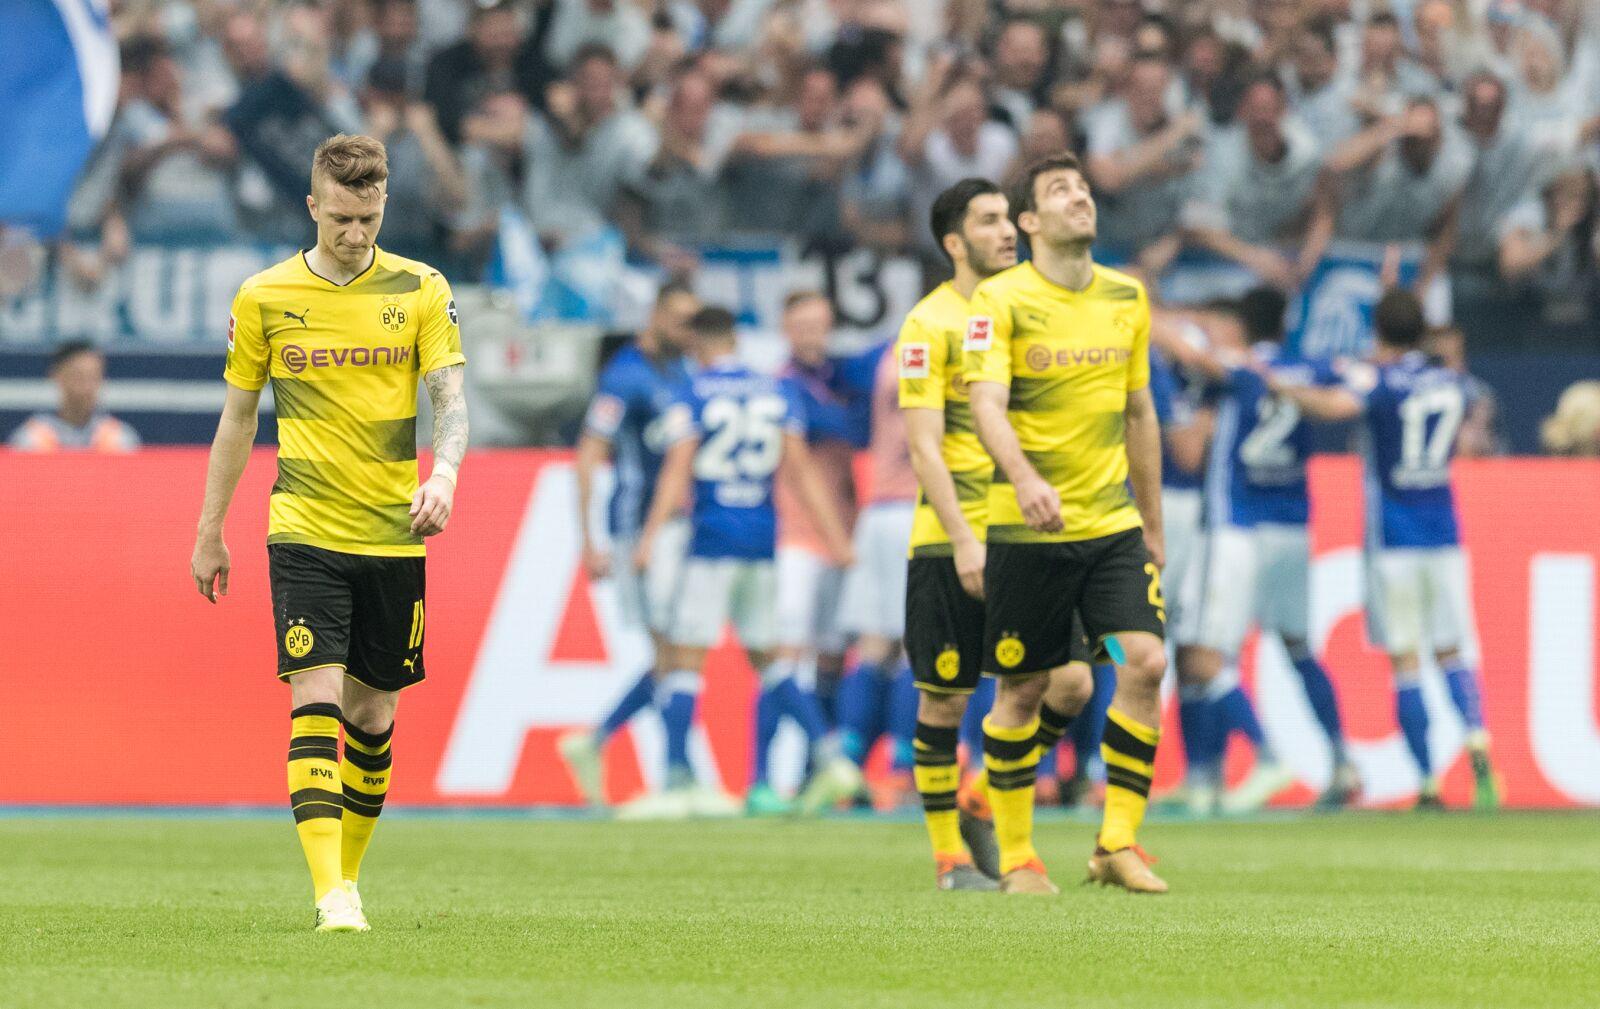 B Leverkusen Vs B Dortmund